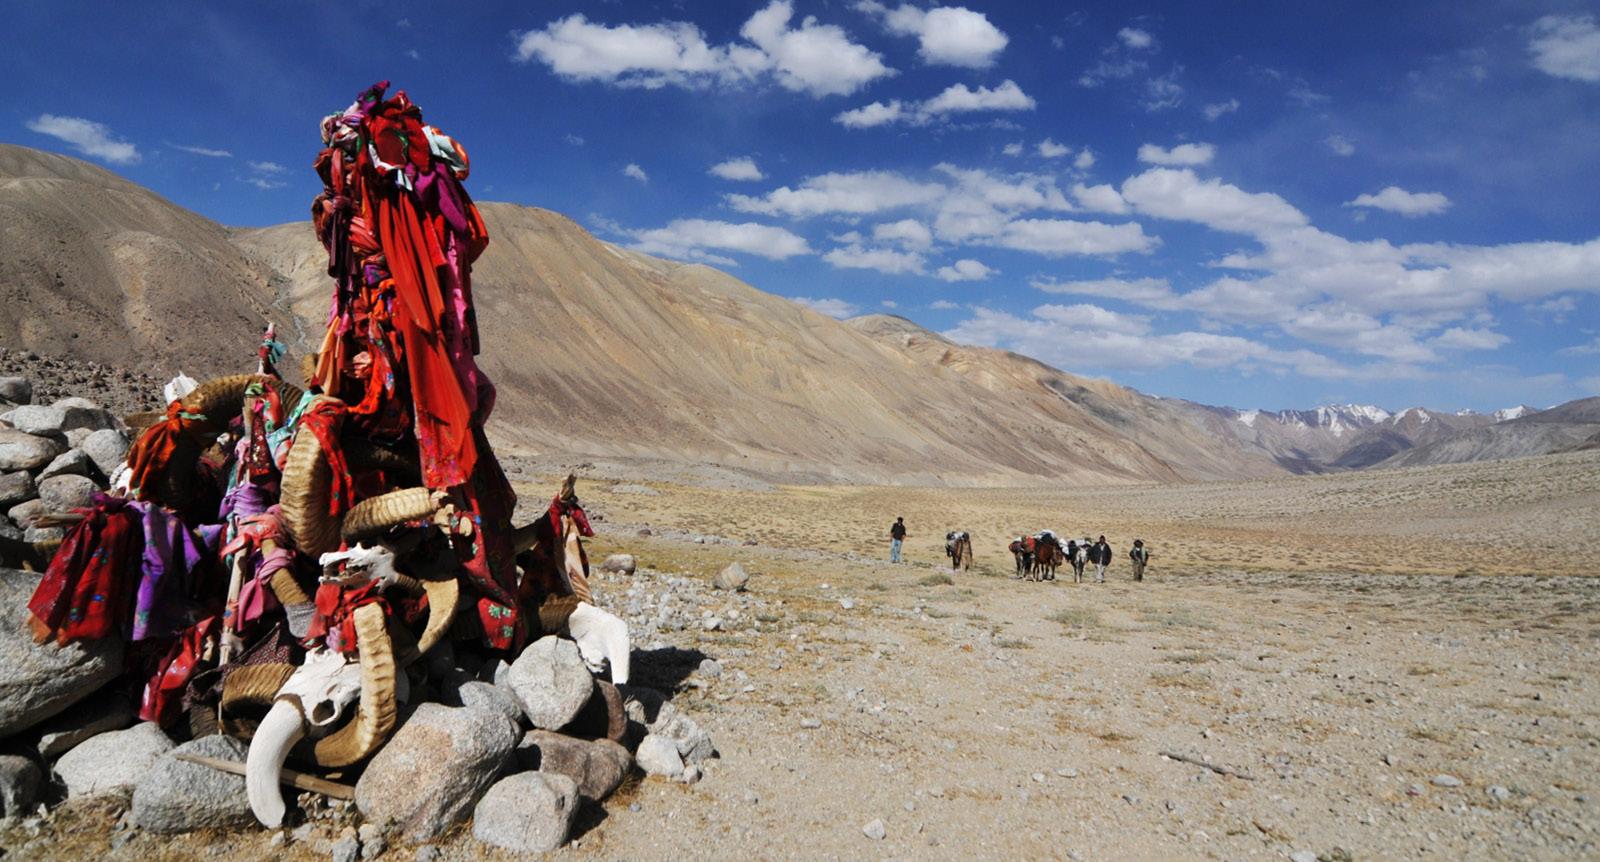 Wakhan Corridor Afghanistan Pamir mountains image